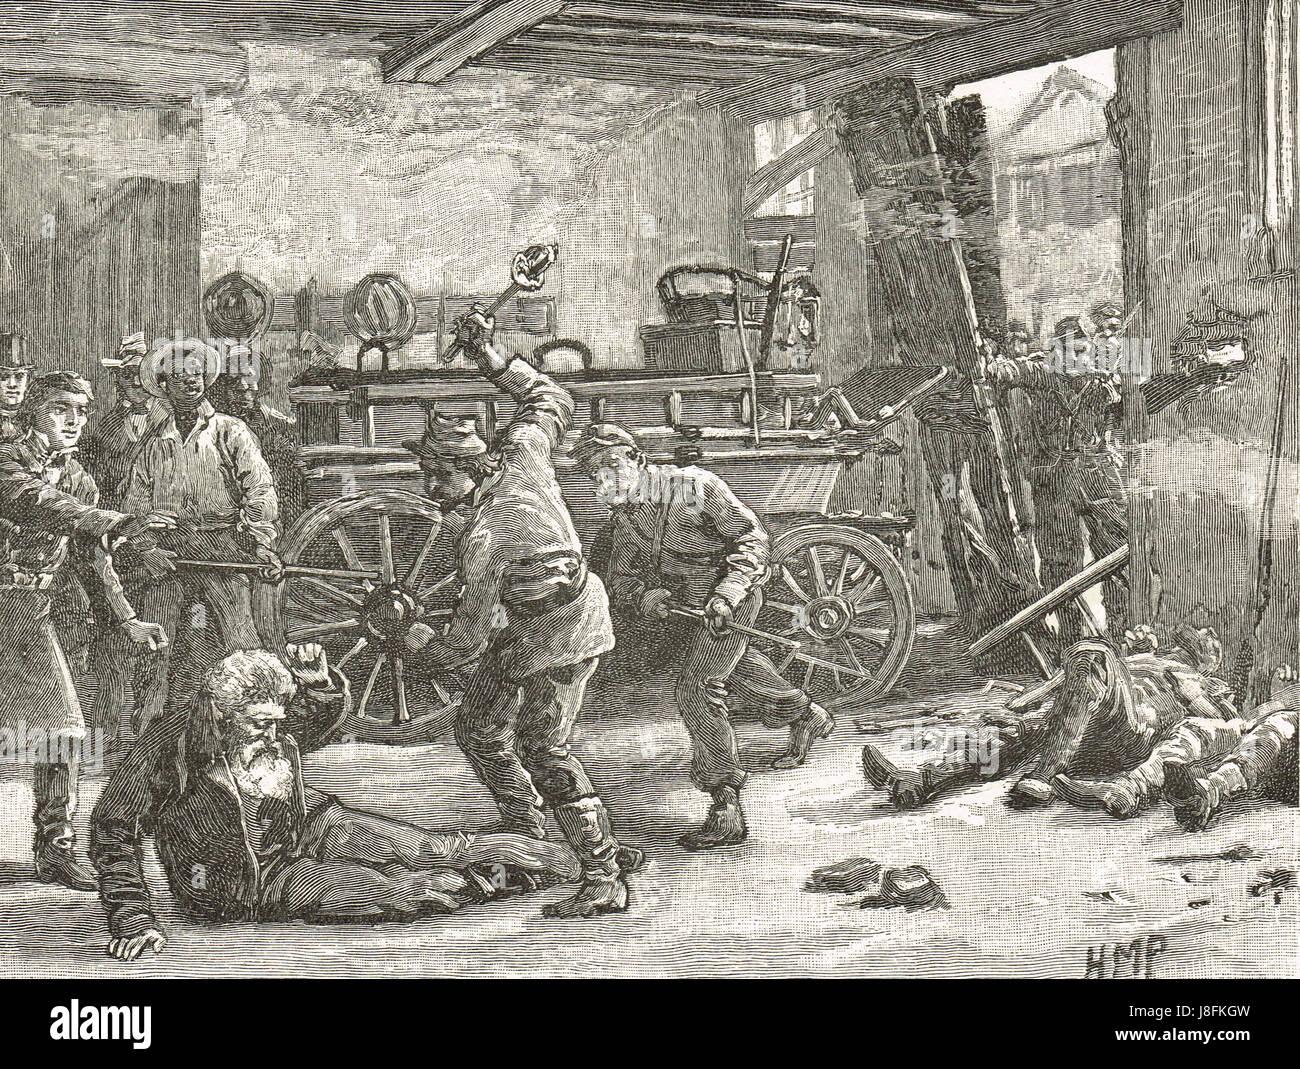 John Brown capture at Harper's Ferry October 18 1859 - Stock Image